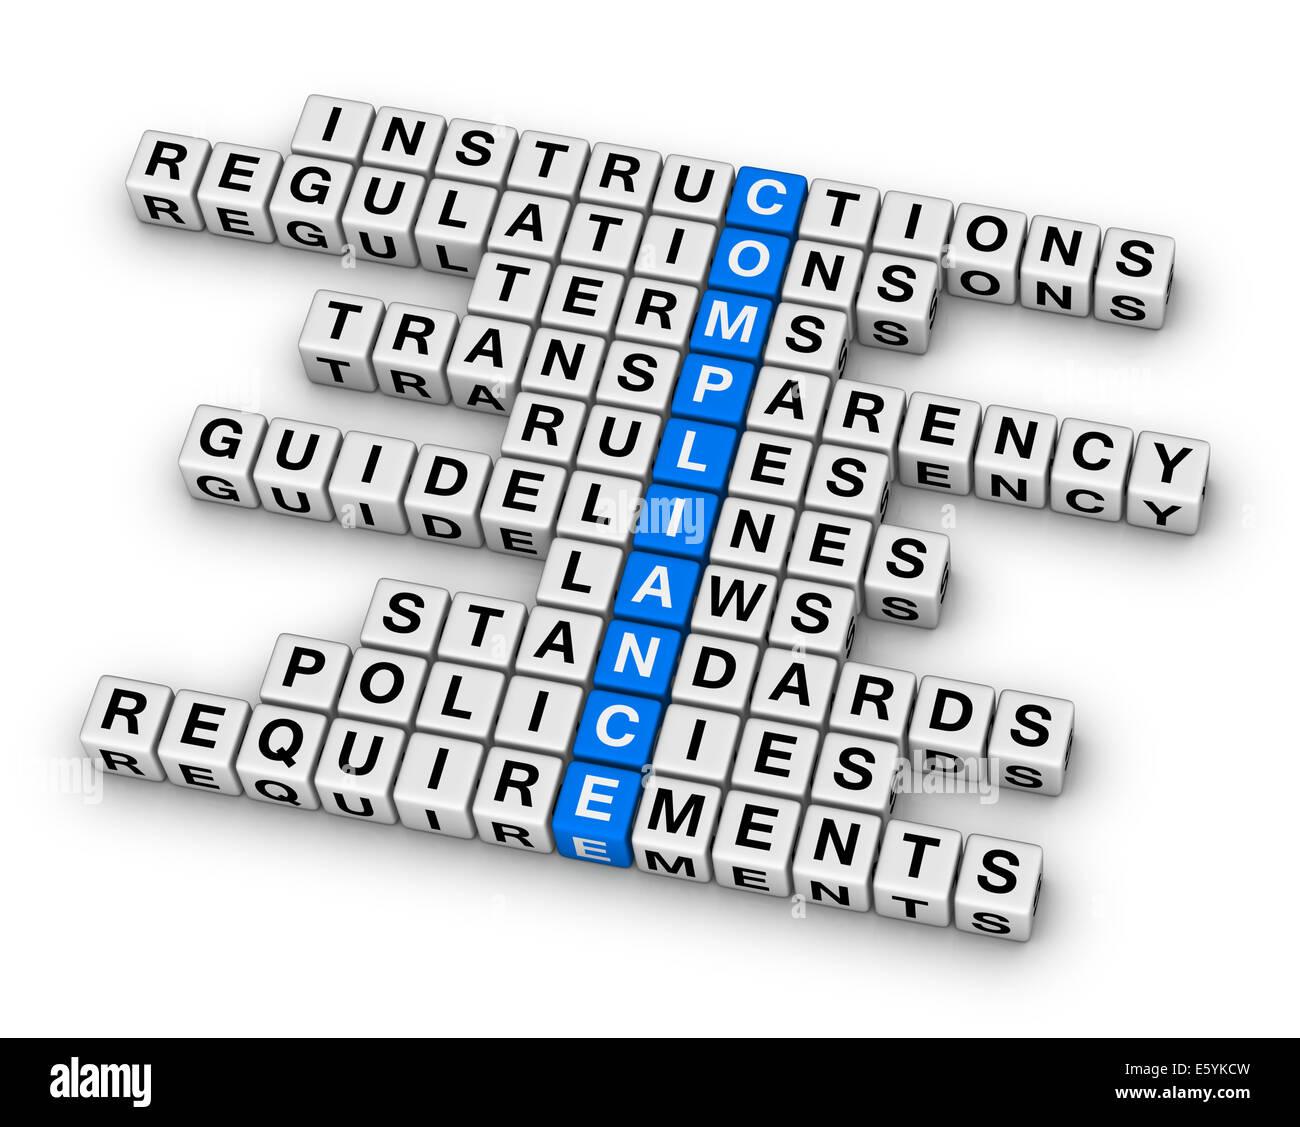 compliance crossword puzzle Stock Photo: 72522713 - Alamy